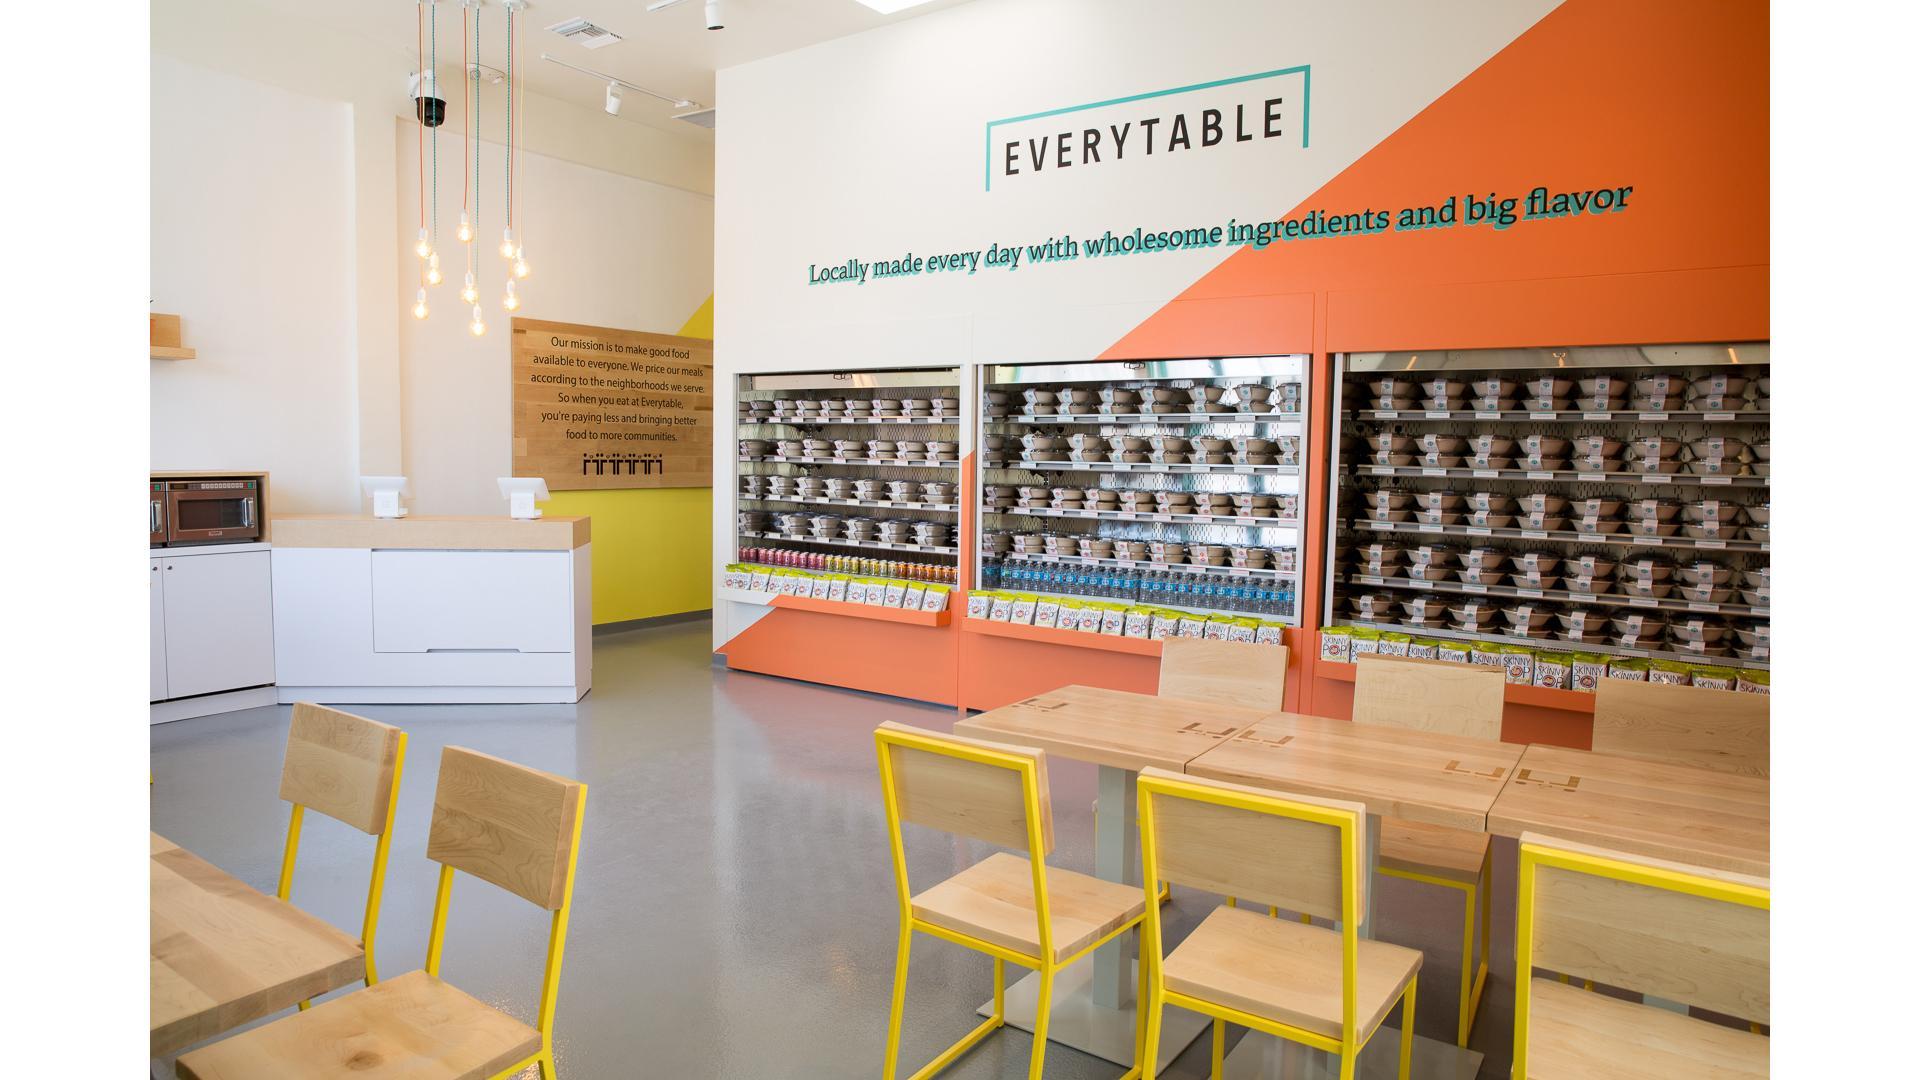 Everytable Hoover interior healthy fast food in Los Angeles California